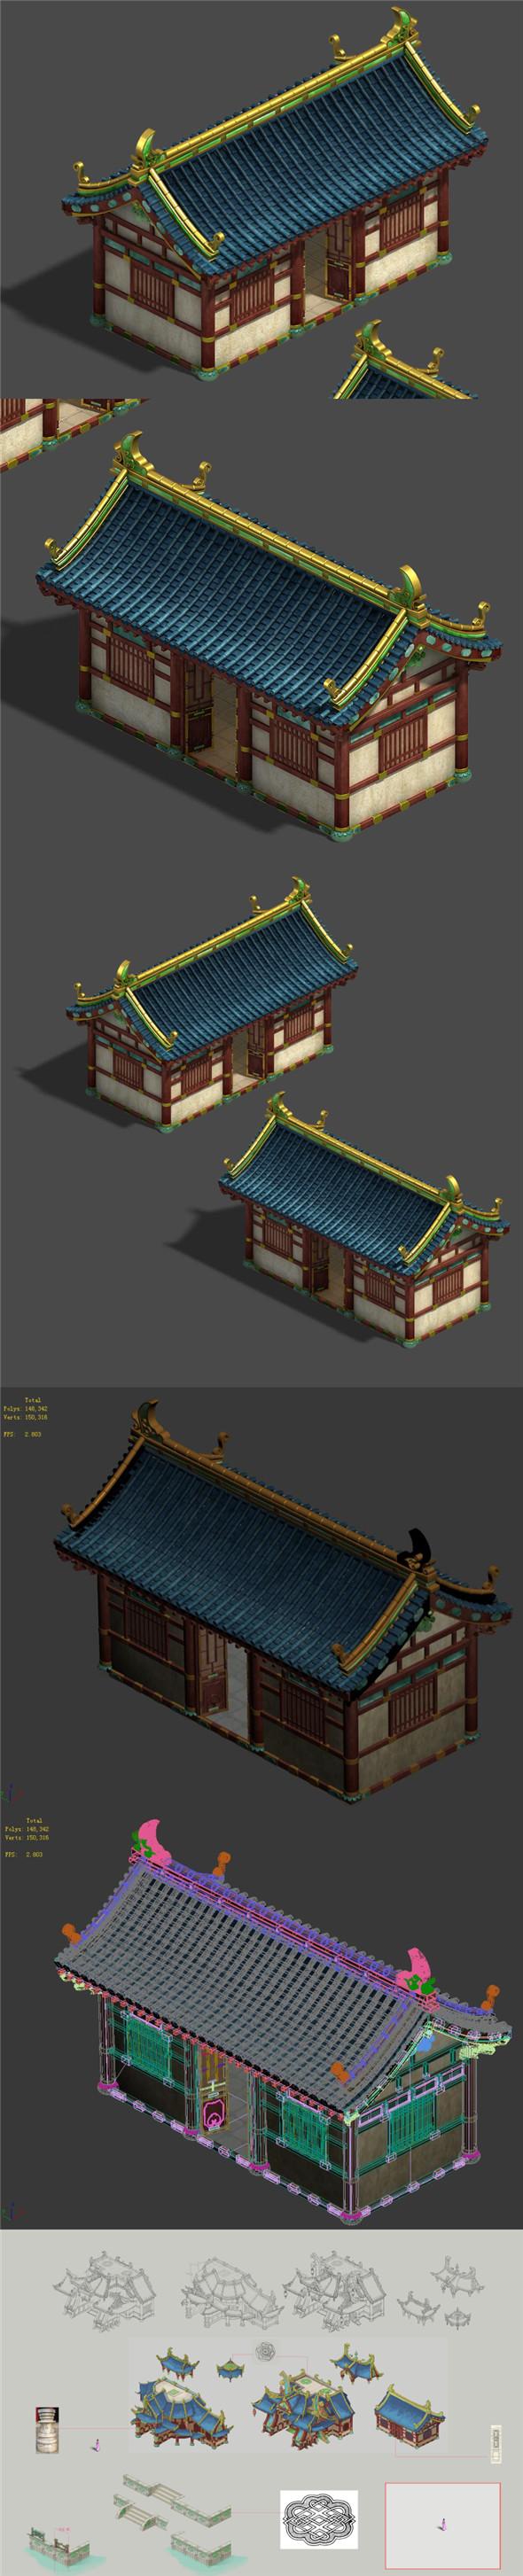 Market - City Building 01 - 3DOcean Item for Sale